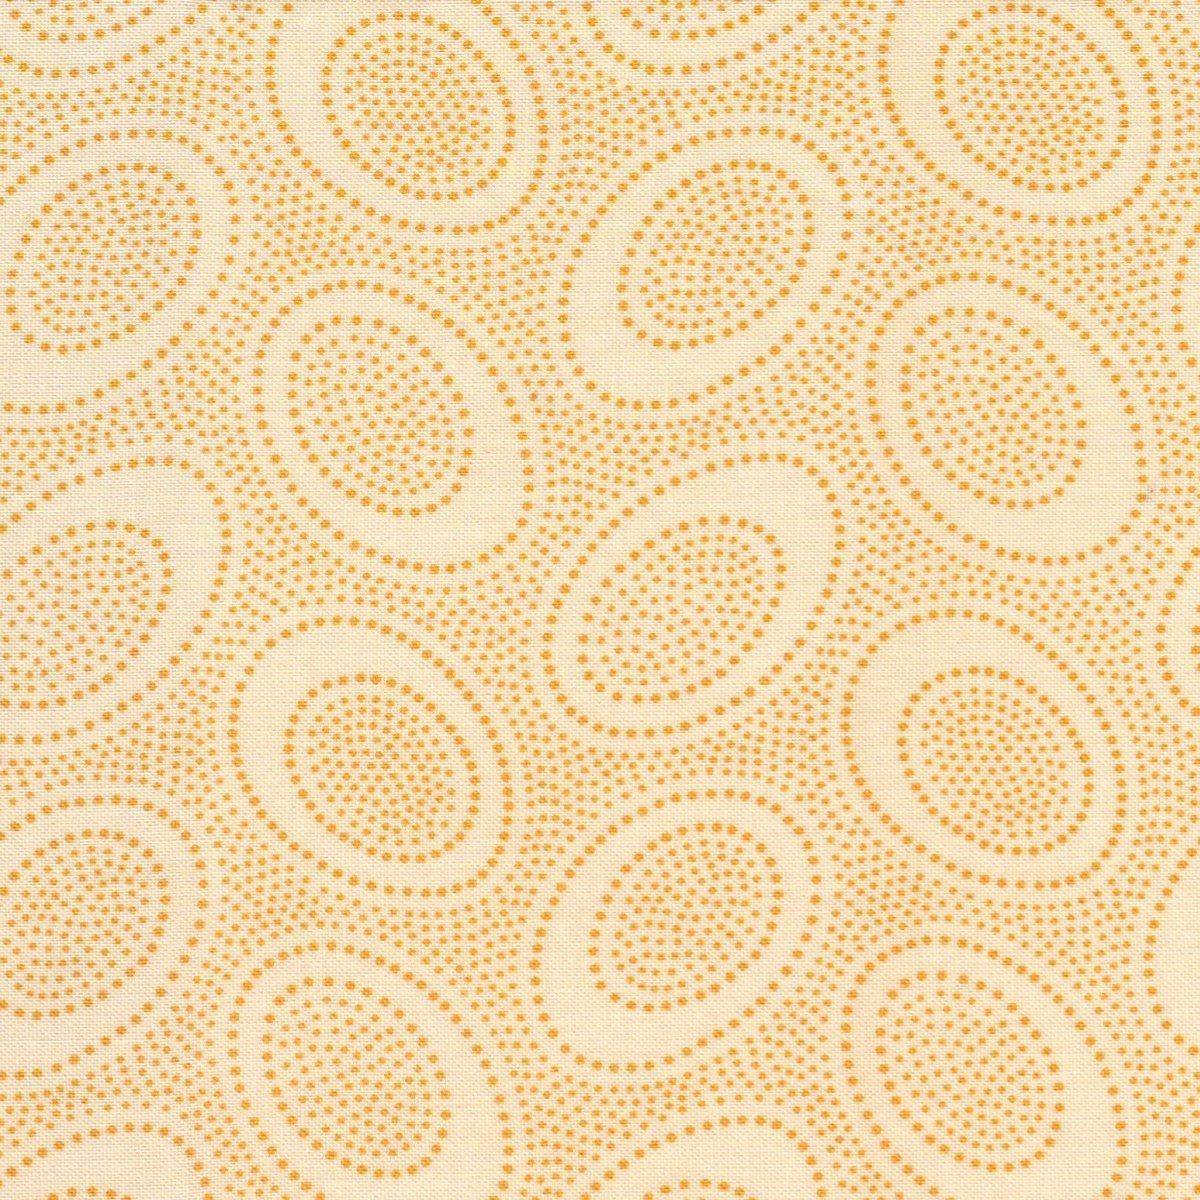 Aborignal Dots - Ivory